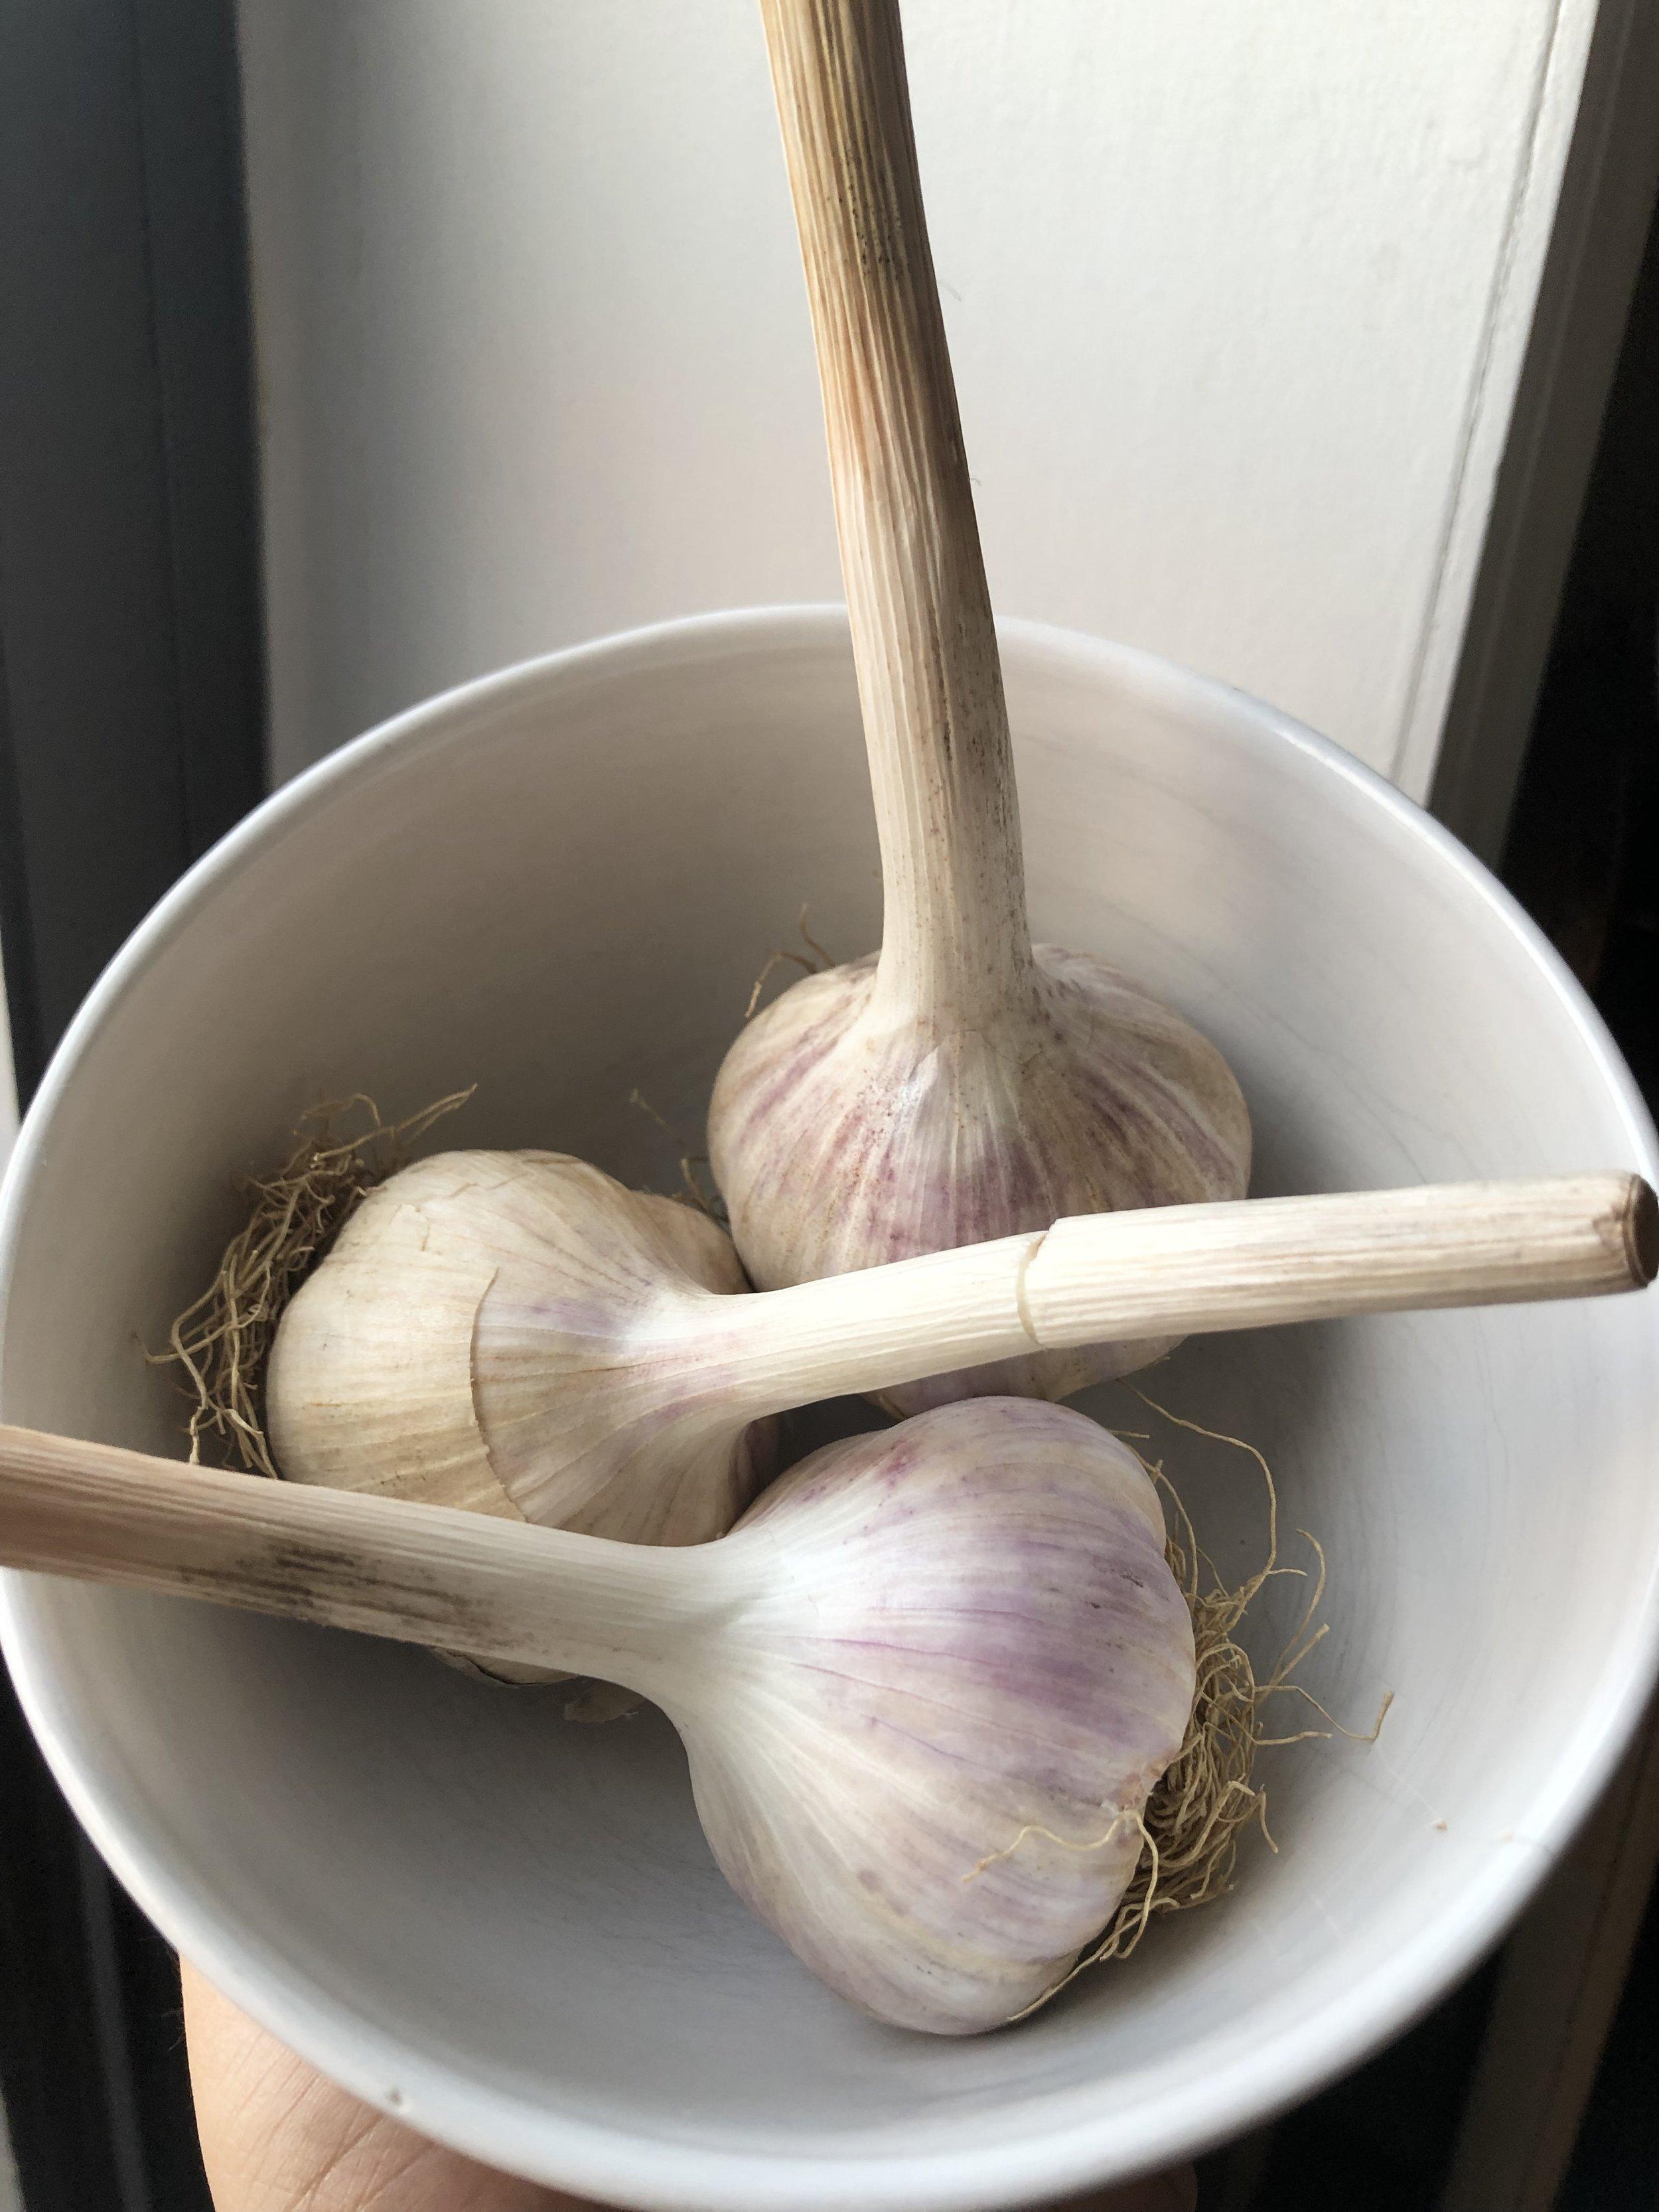 Garlic Share first Distribution